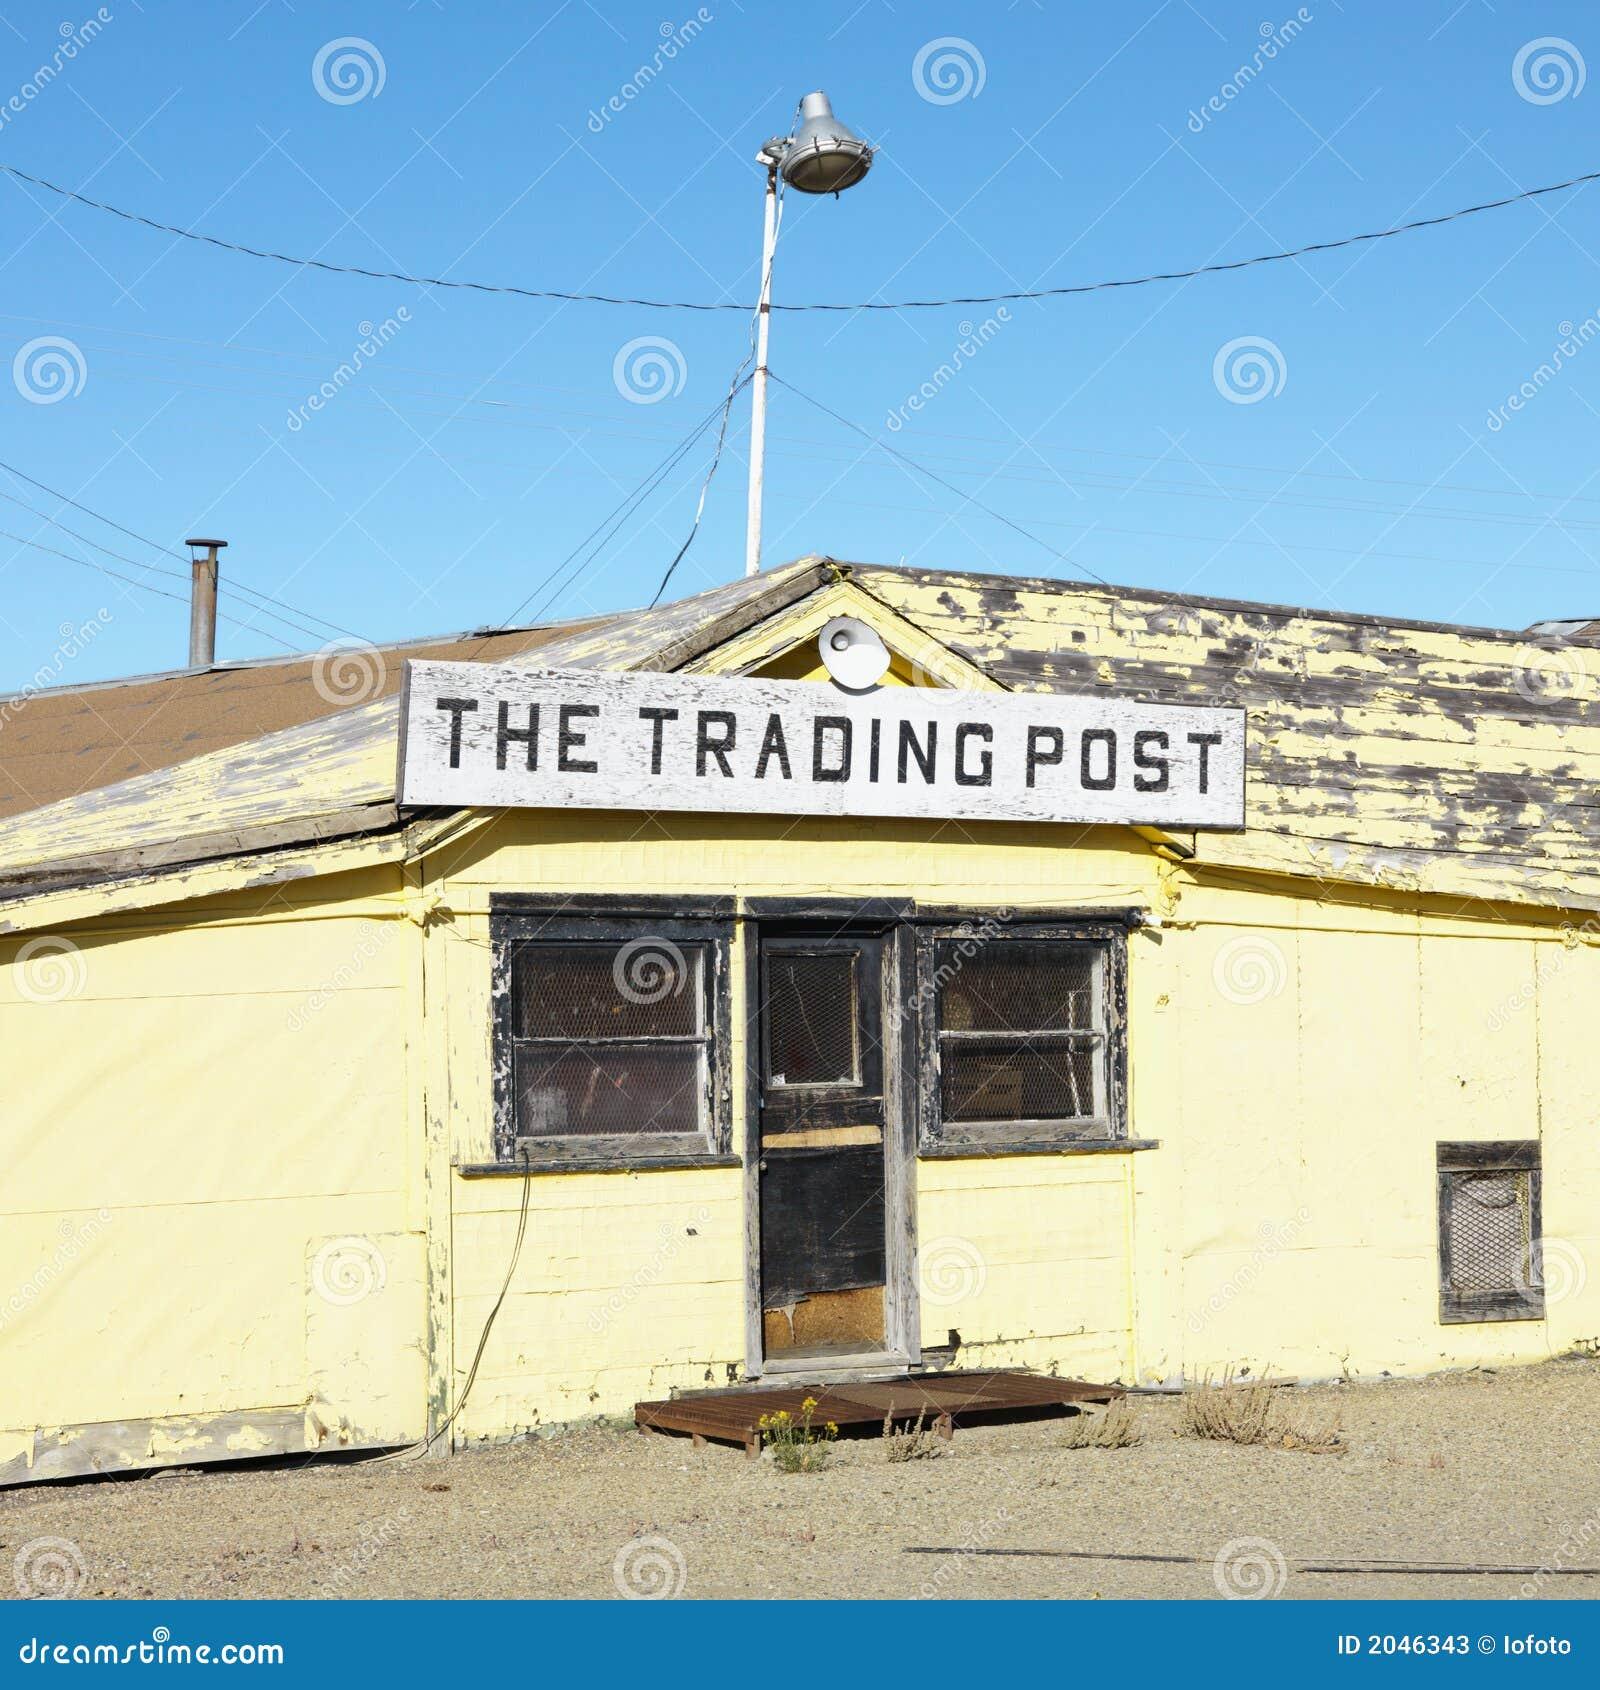 Old Trading Post In Desert Stock Photos